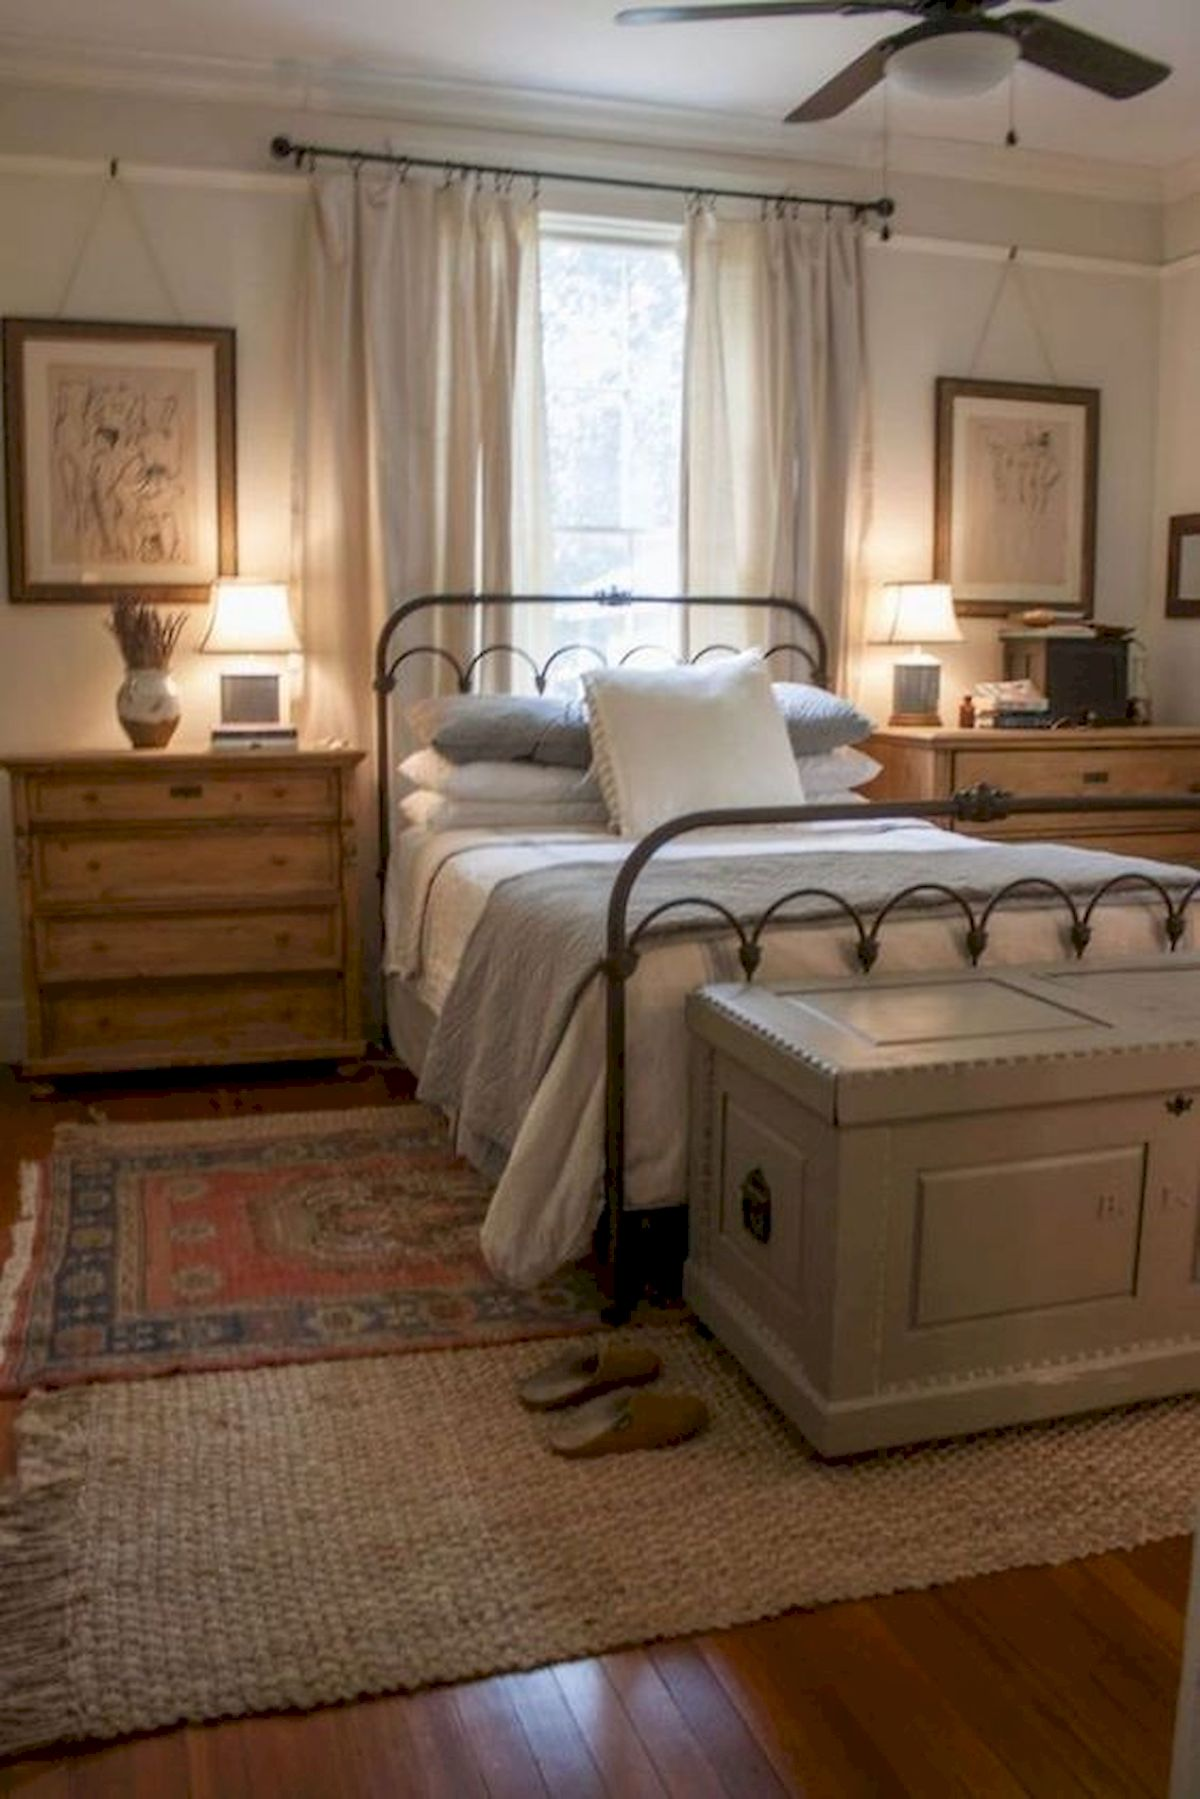 60 Beautiful Bedroom Decor and Design Ideas (10)